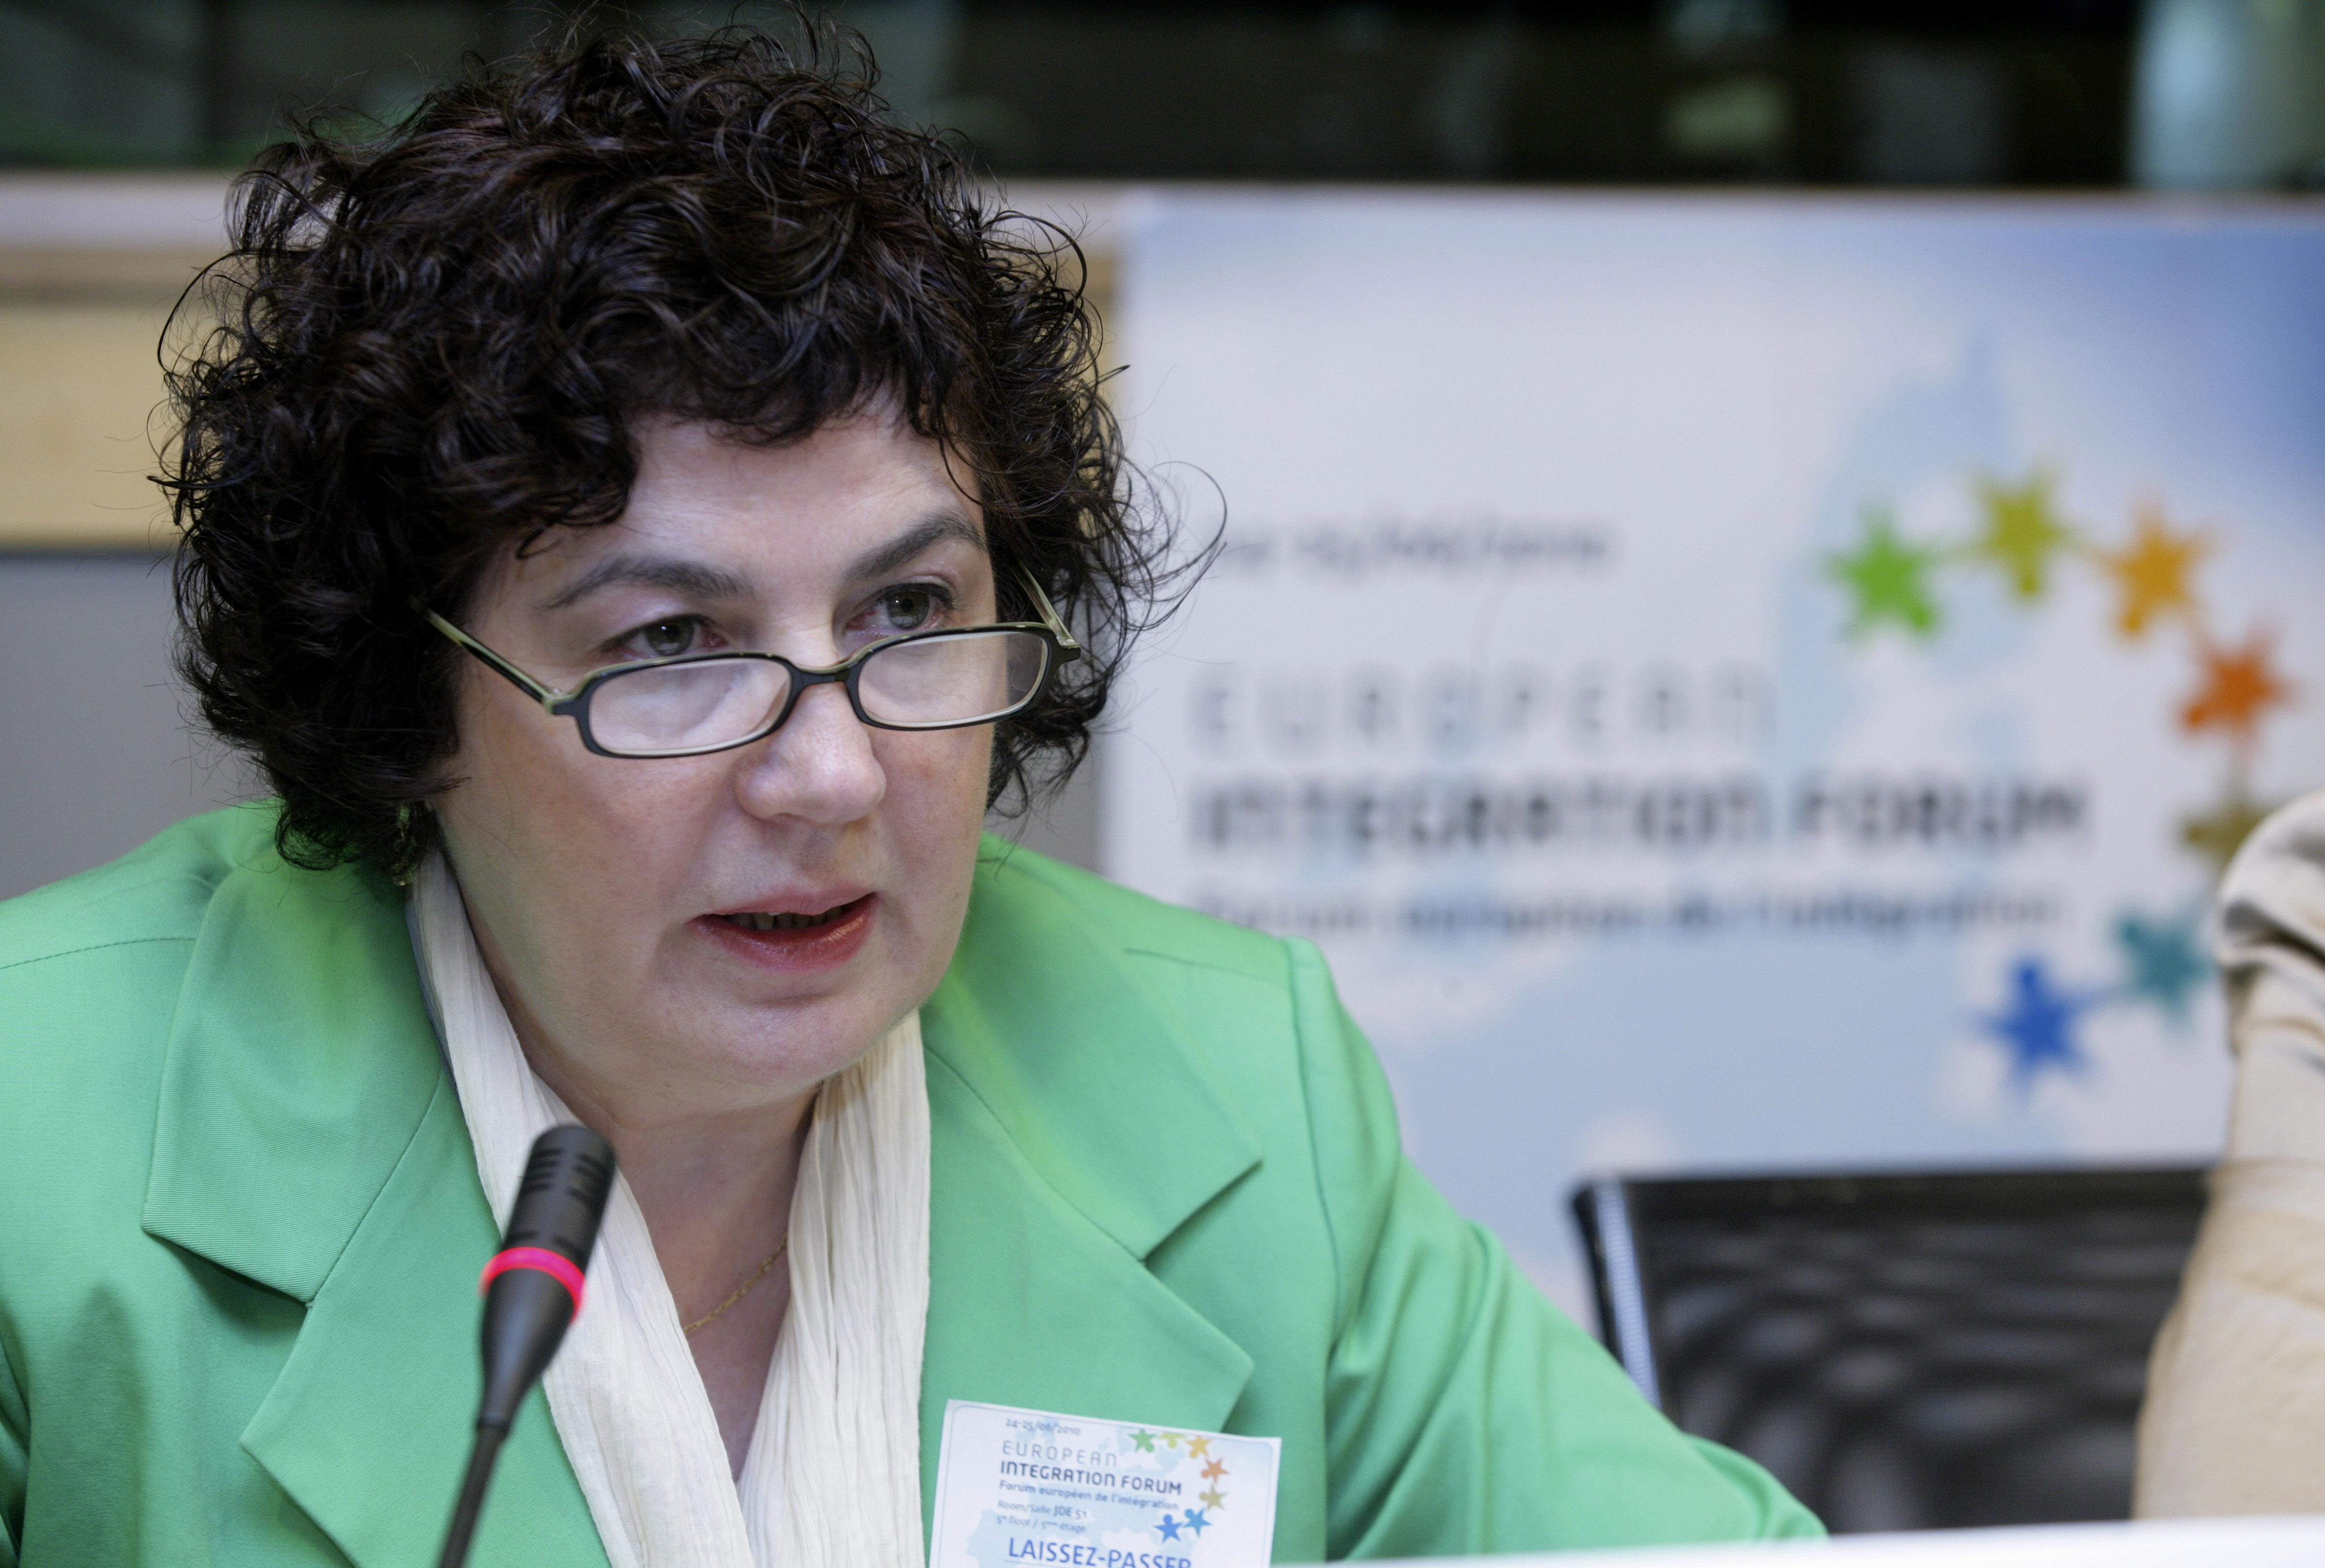 05. Estrella Rodriguez Pardo, representative of the Spanish Presidency of the Council of the EU